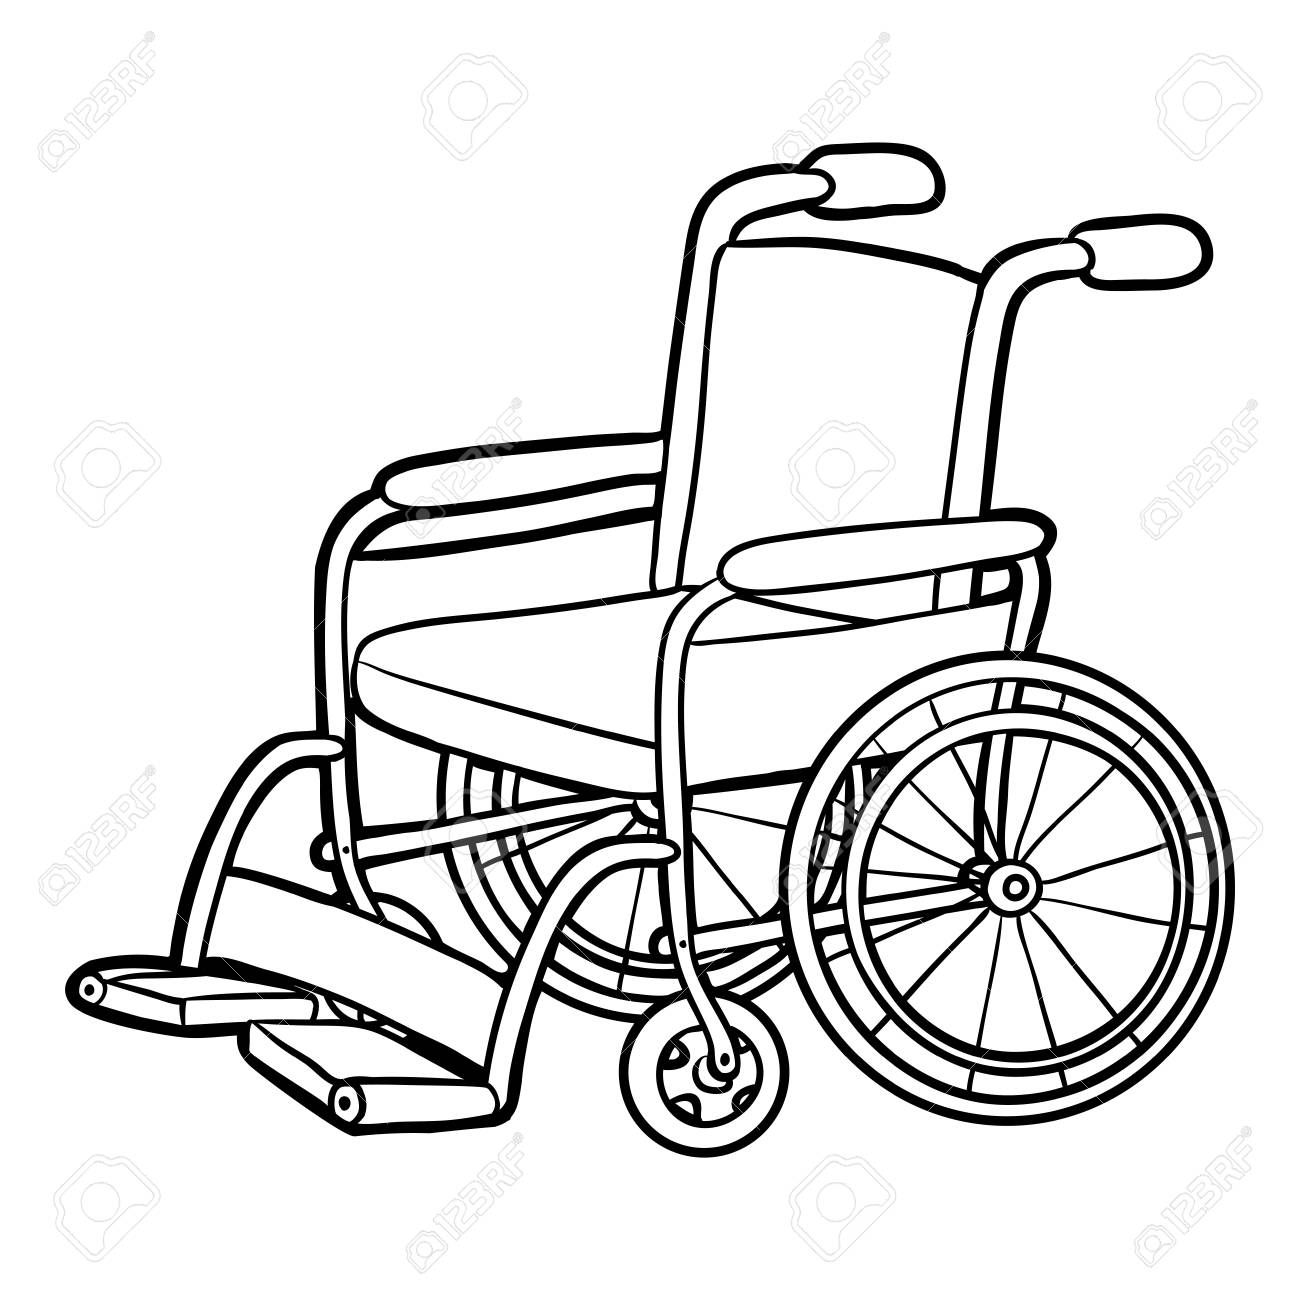 Wheel Chair Drawing At Getdrawings